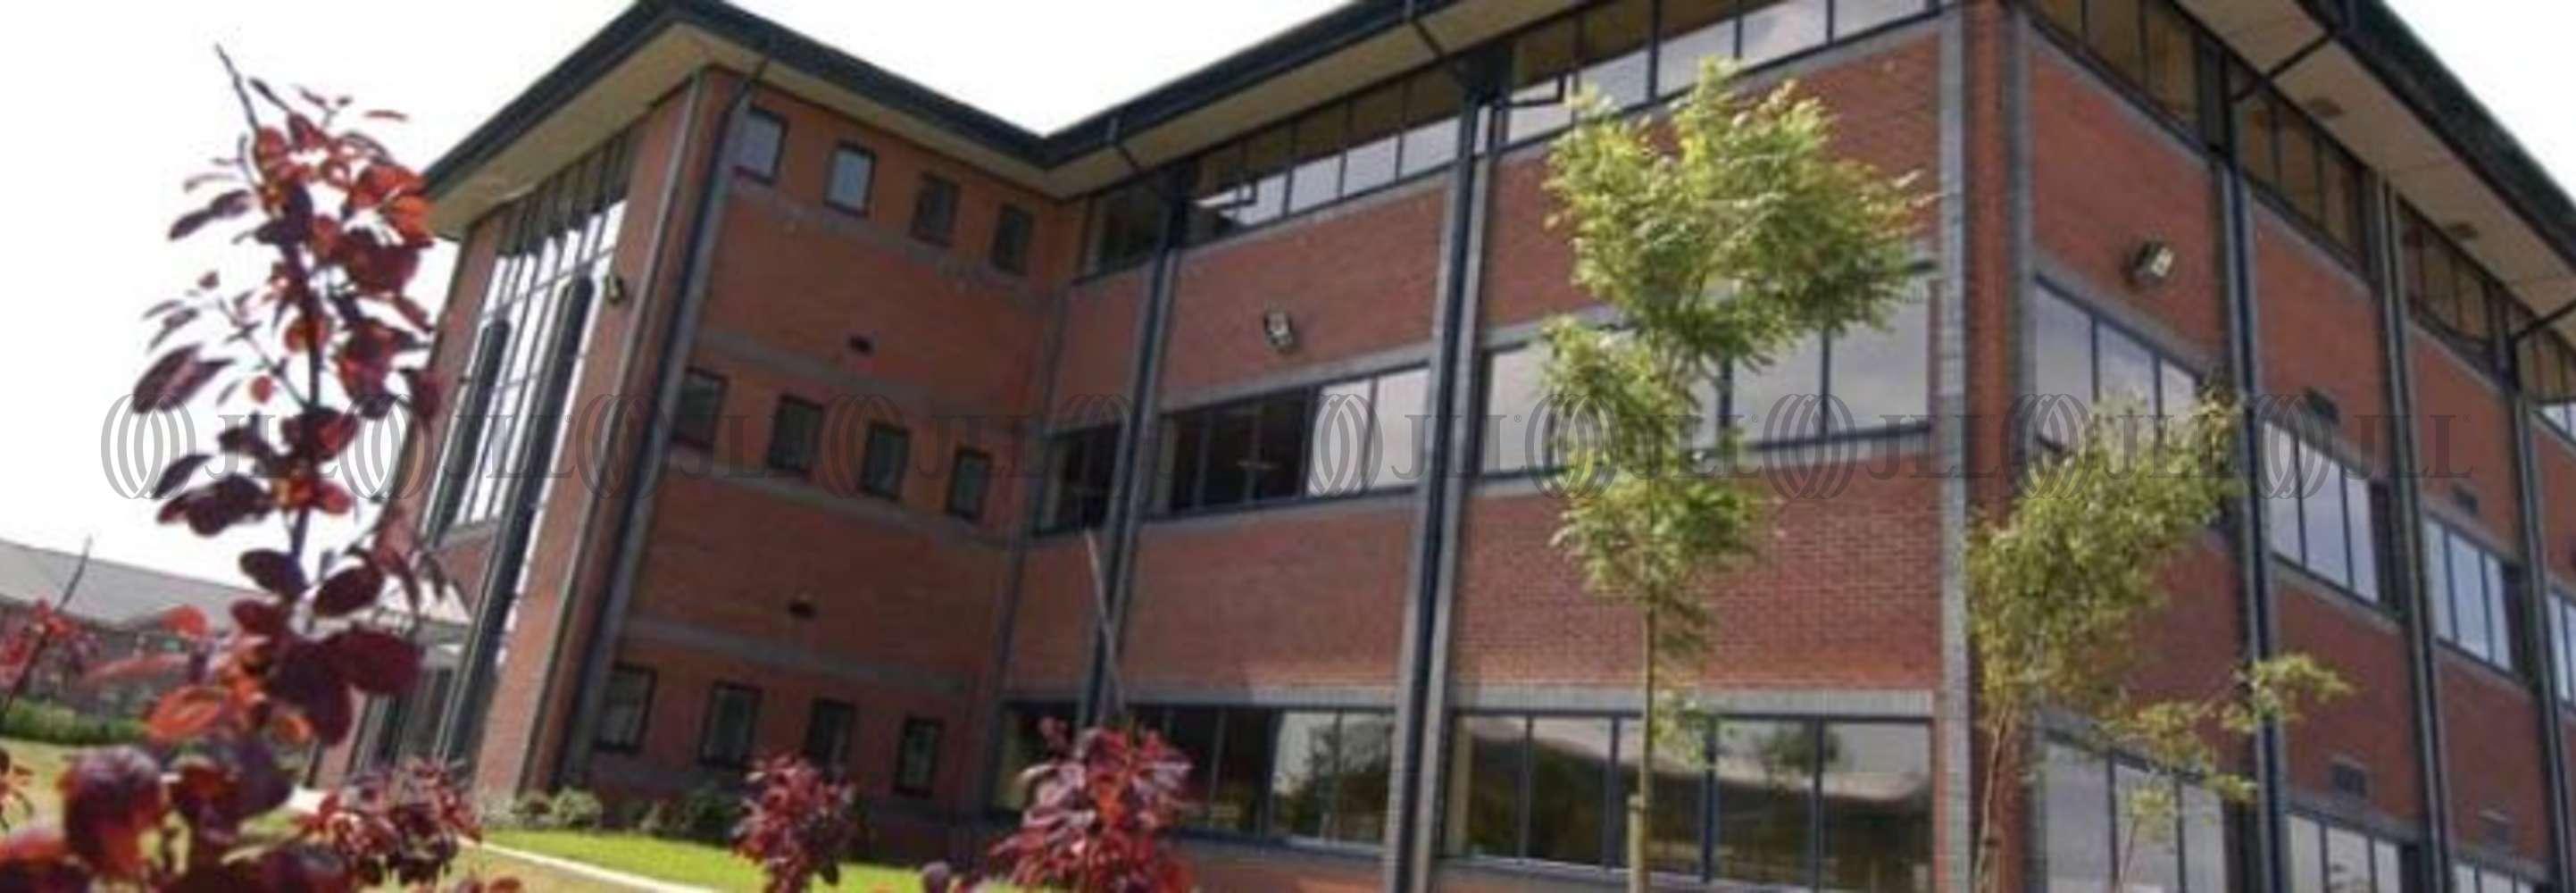 Office Blackpool, FY2 0JW - Faraday Court